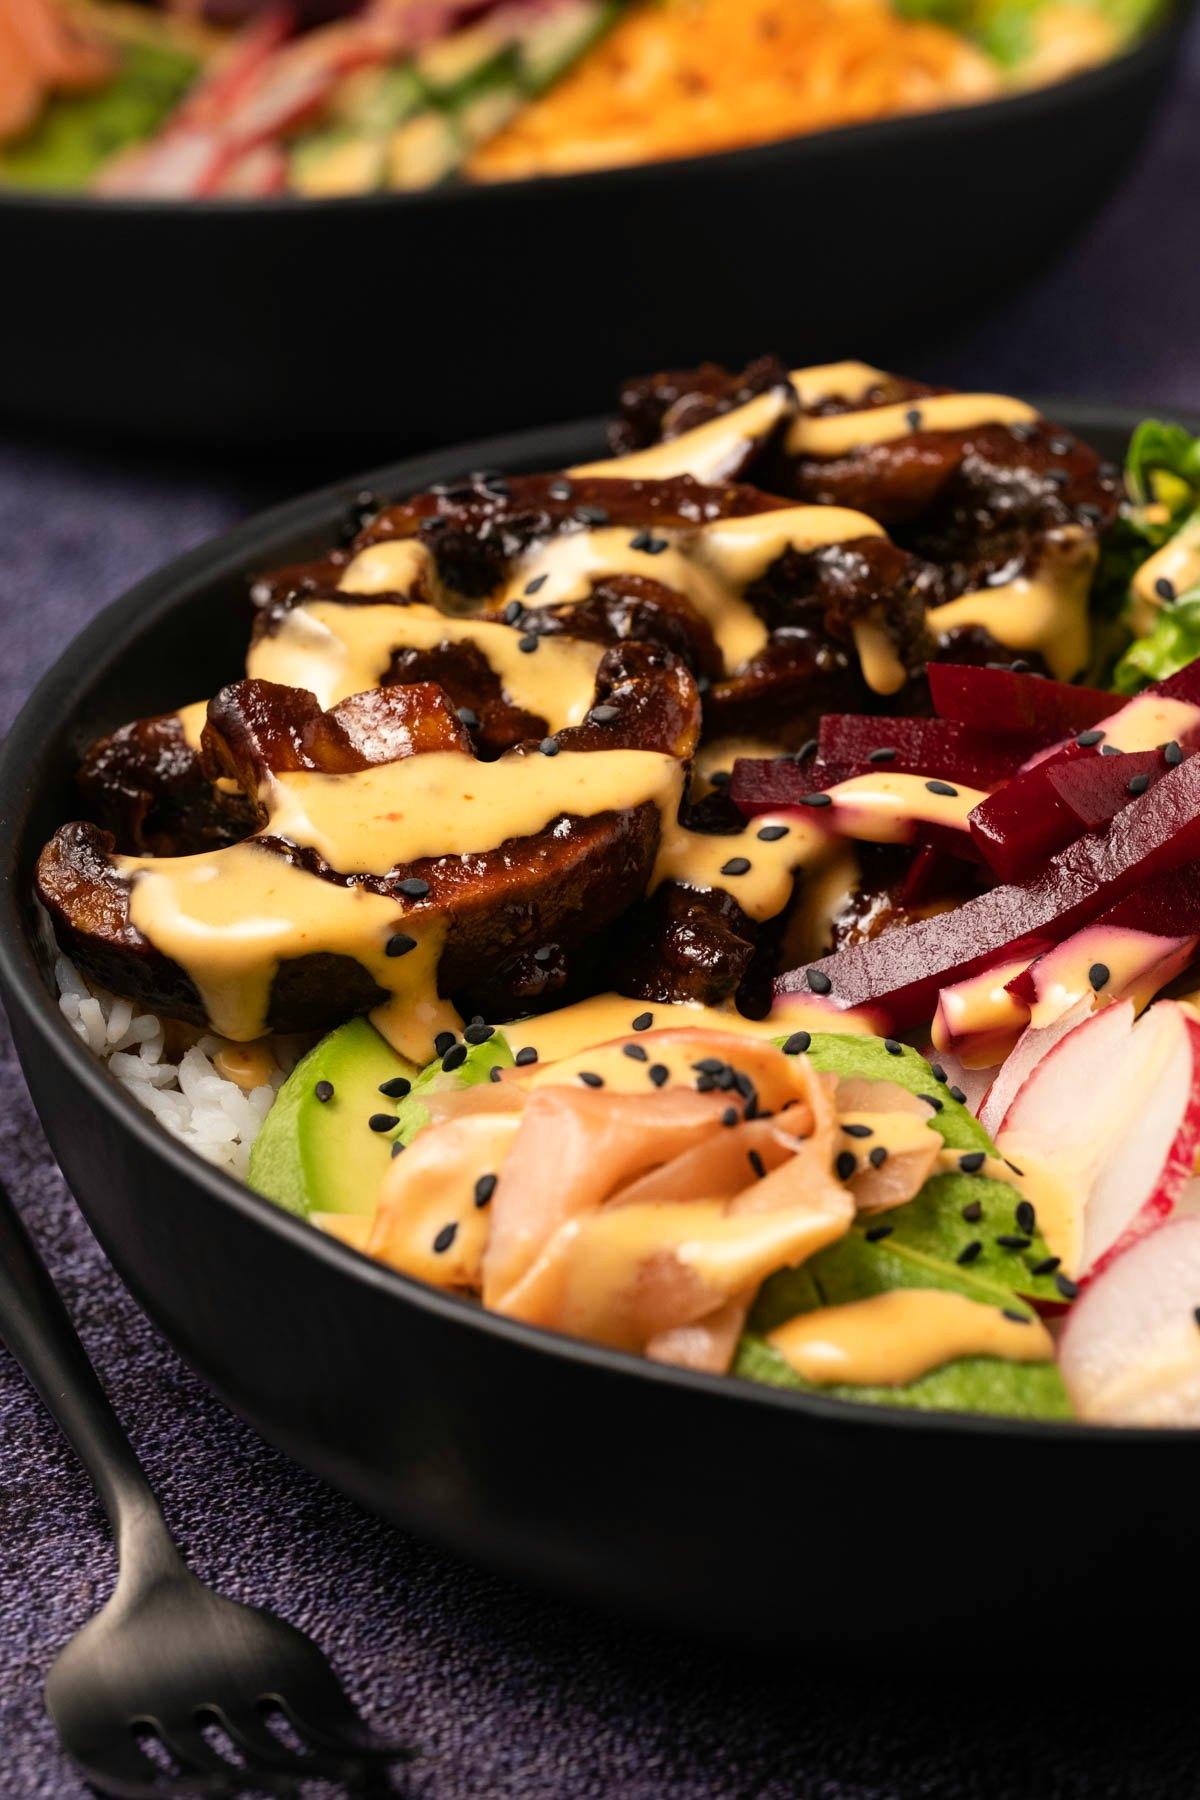 Black bowl with veggies, rice and salad.